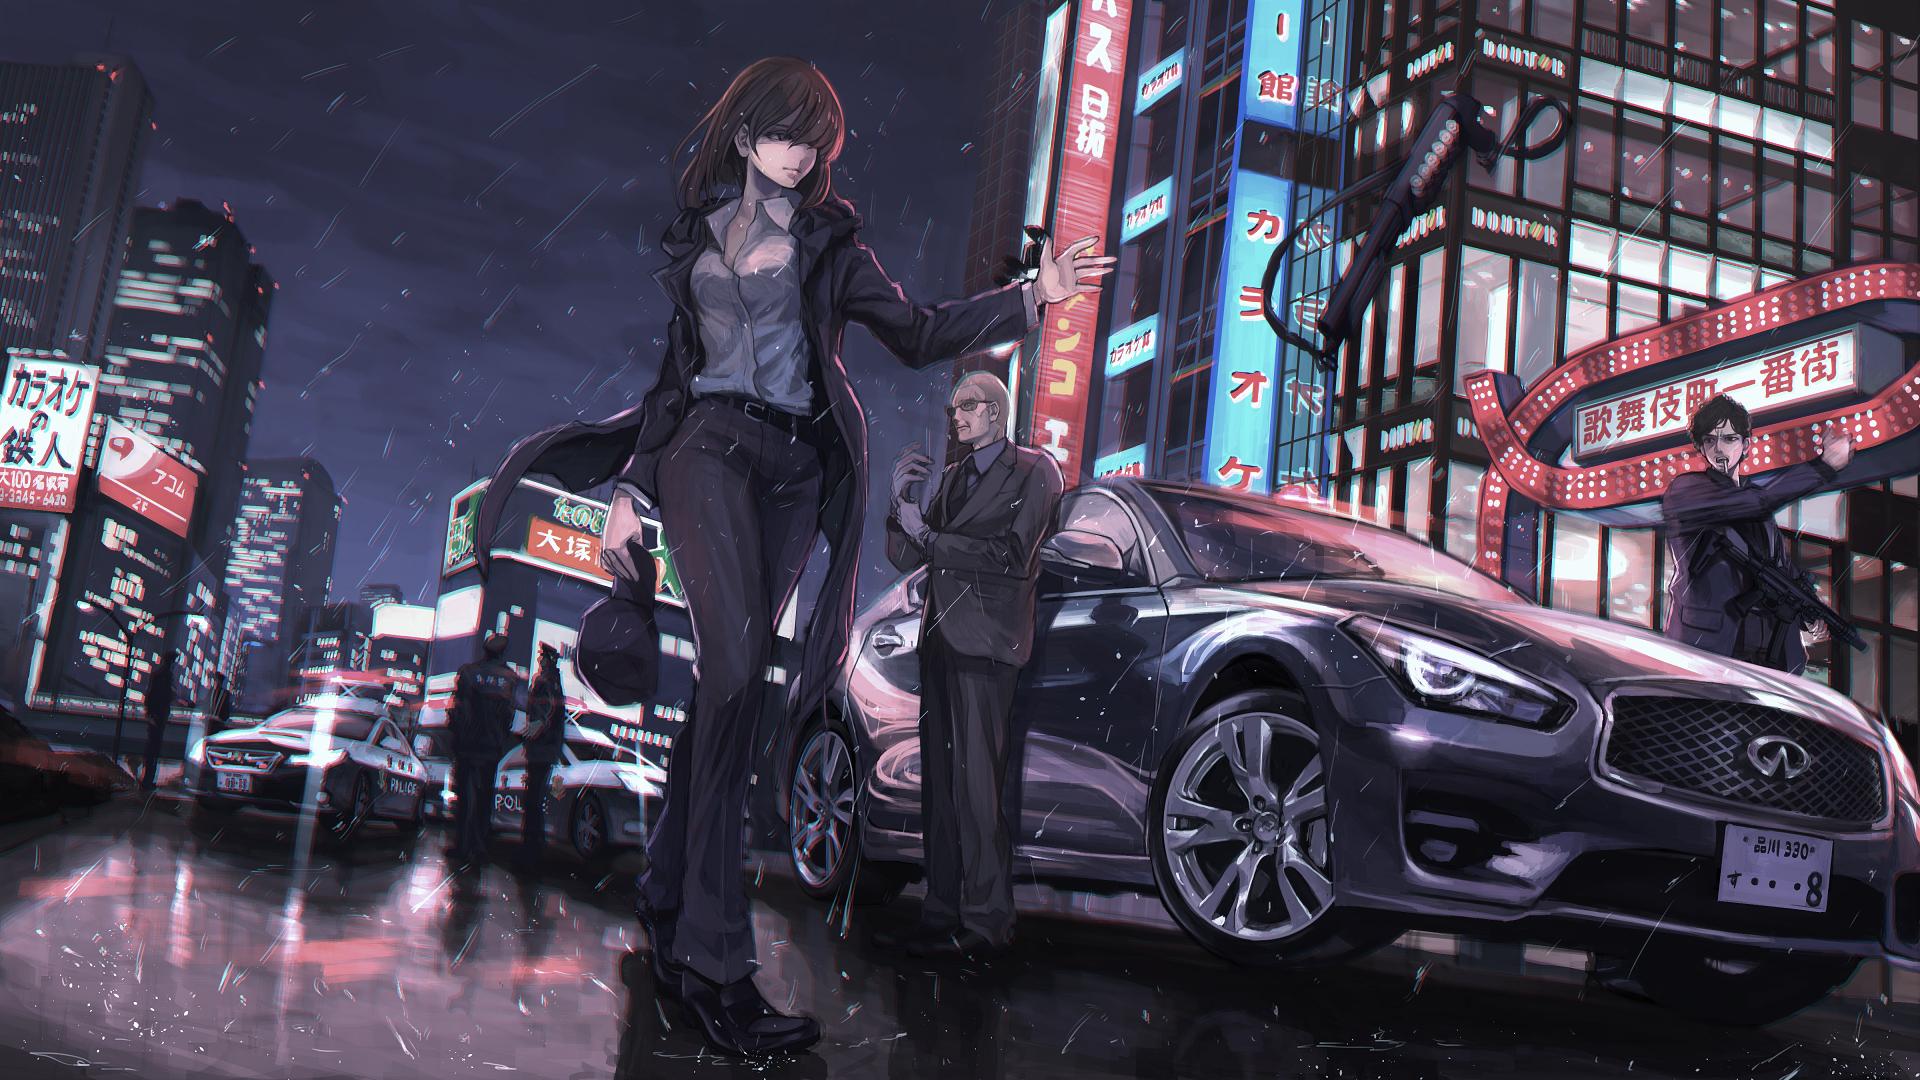 Great Wallpaper Anime Car - gun-anime-car-vehicle-koh-performance-car-supercar-land-vehicle-automotive-design-automobile-make-luxury-vehicle-auto-show-15040  Pictures_758270      .png